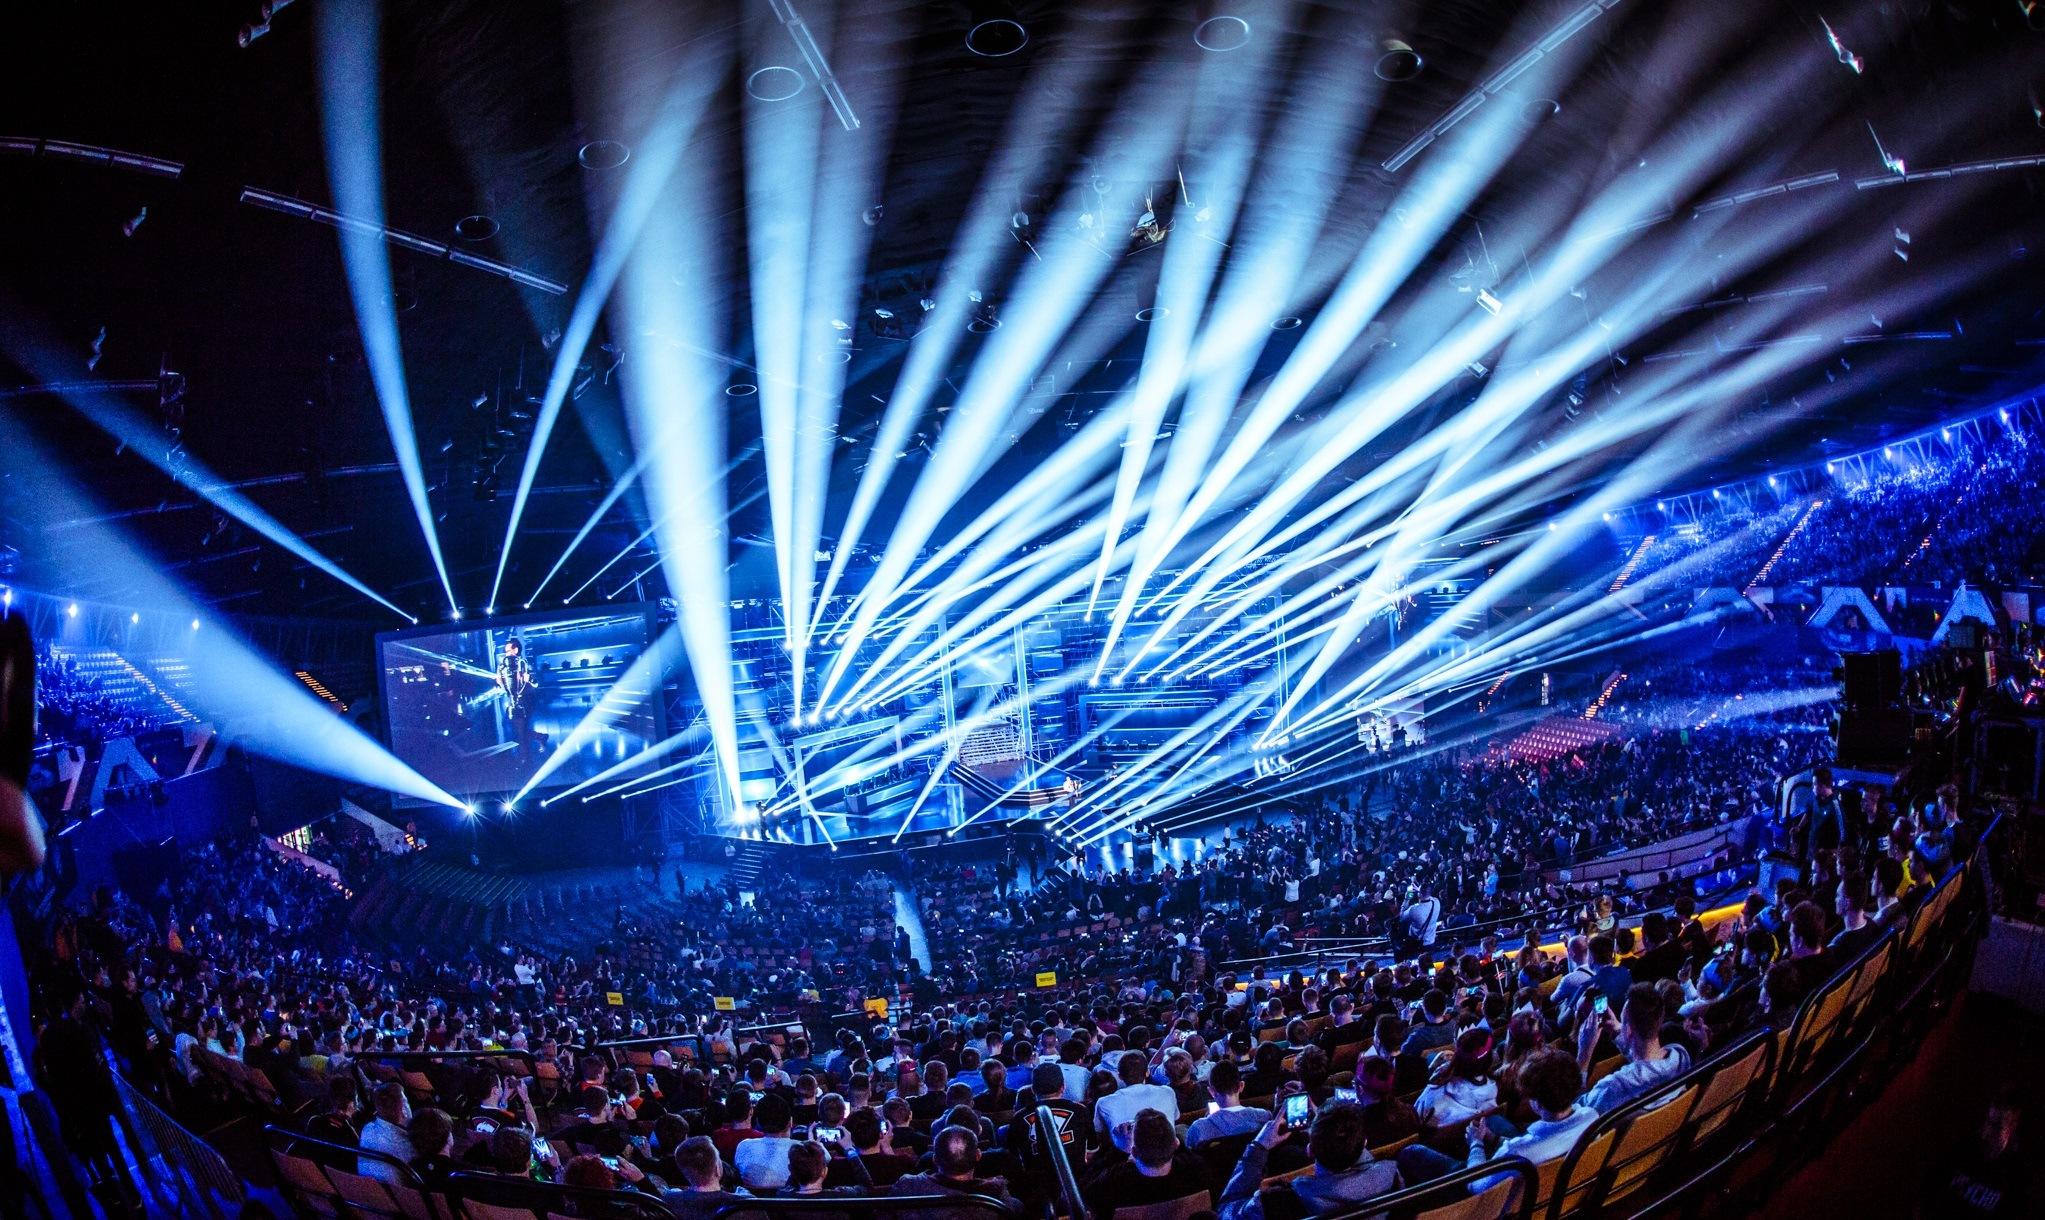 IEM Katowice to be played away from crowd due to Coronavirus